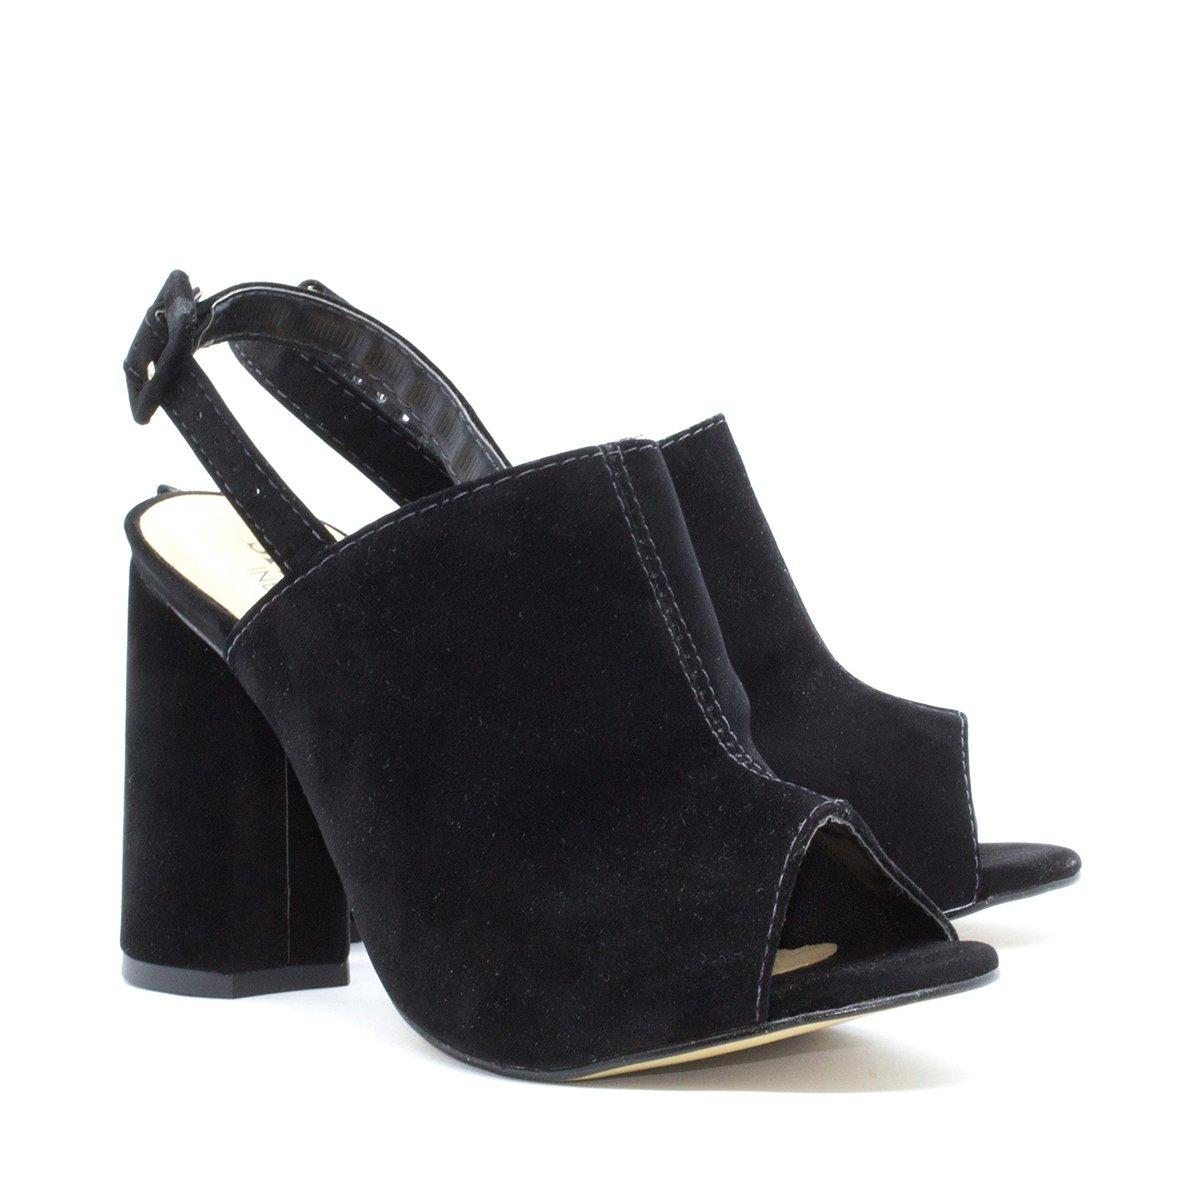 Sandália Inbox Salto Sandália Grosso Preto Shoes Boot Feminina Sandal Sandal 6wUqP5